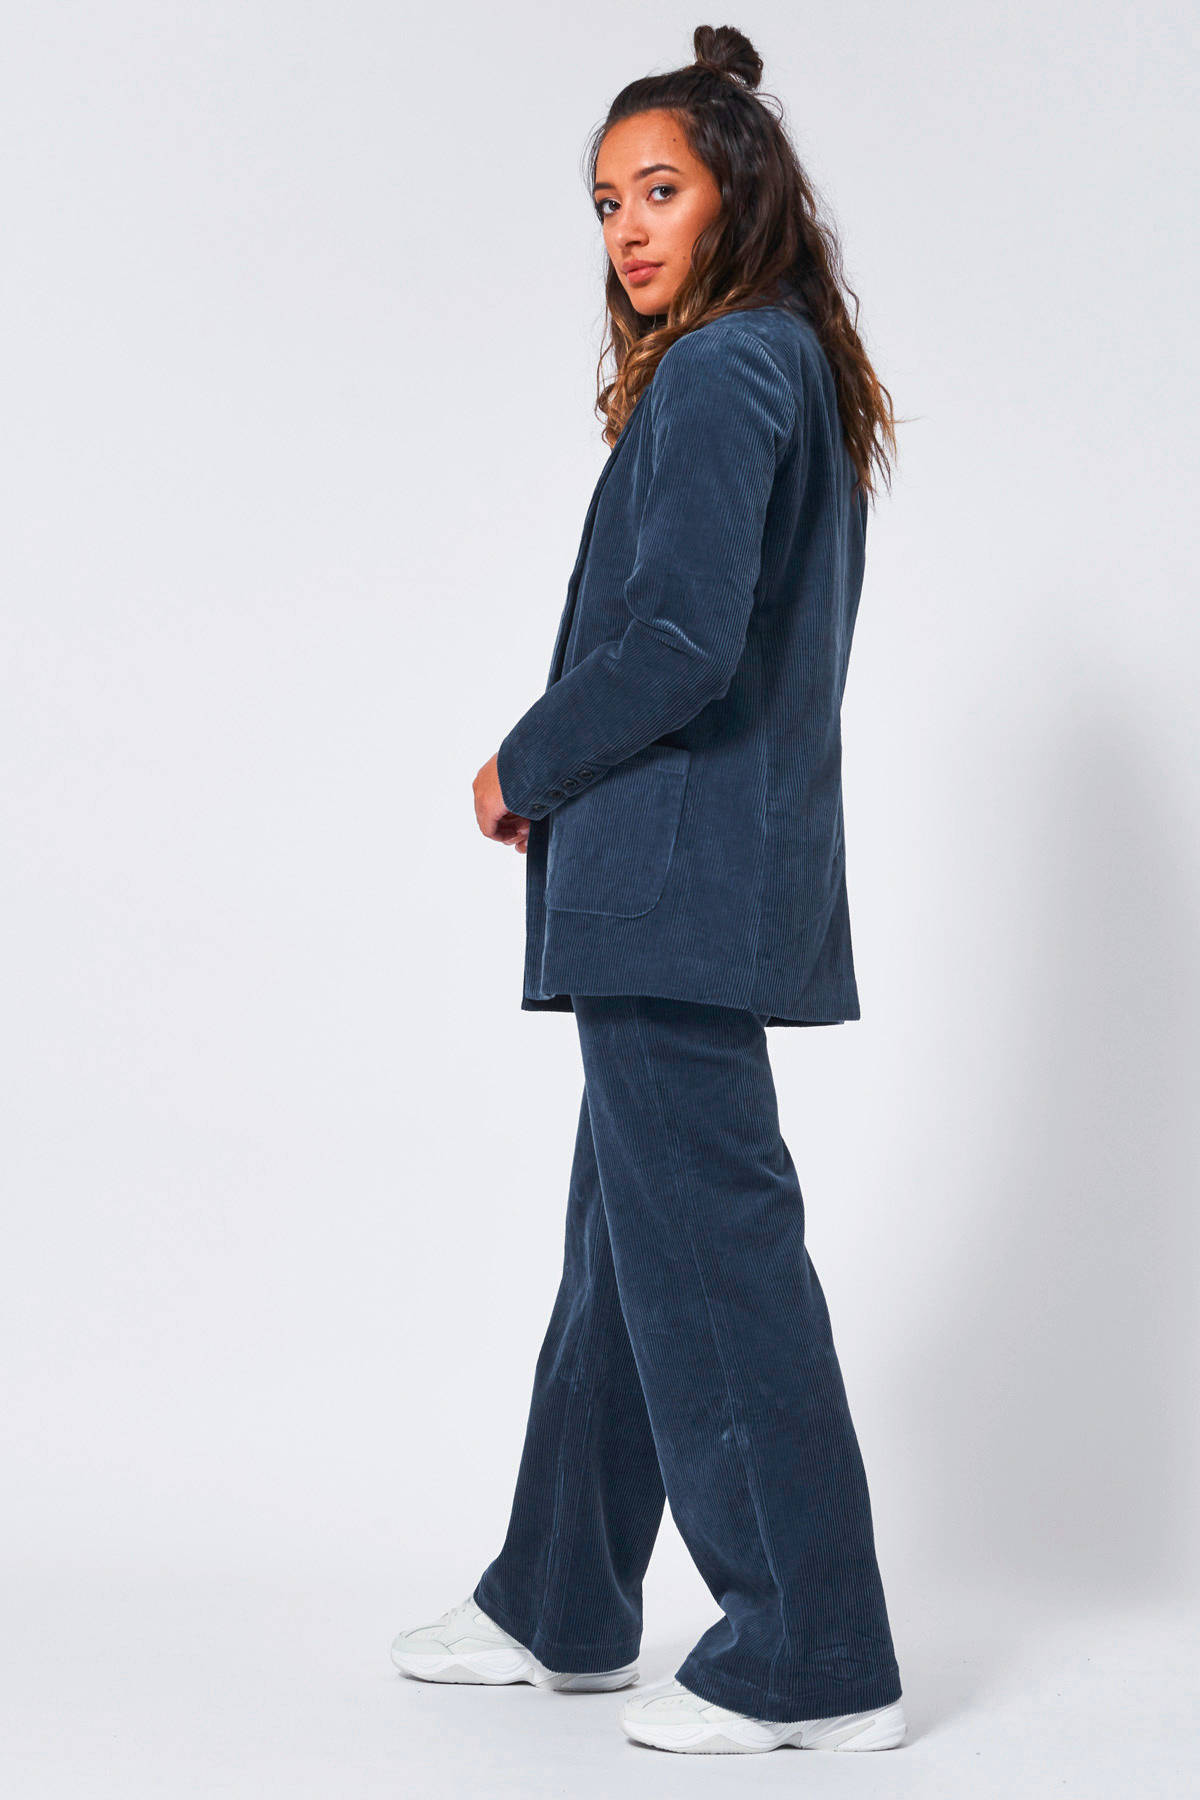 America Today corduroy high waist flared broek blauw | wehkamp